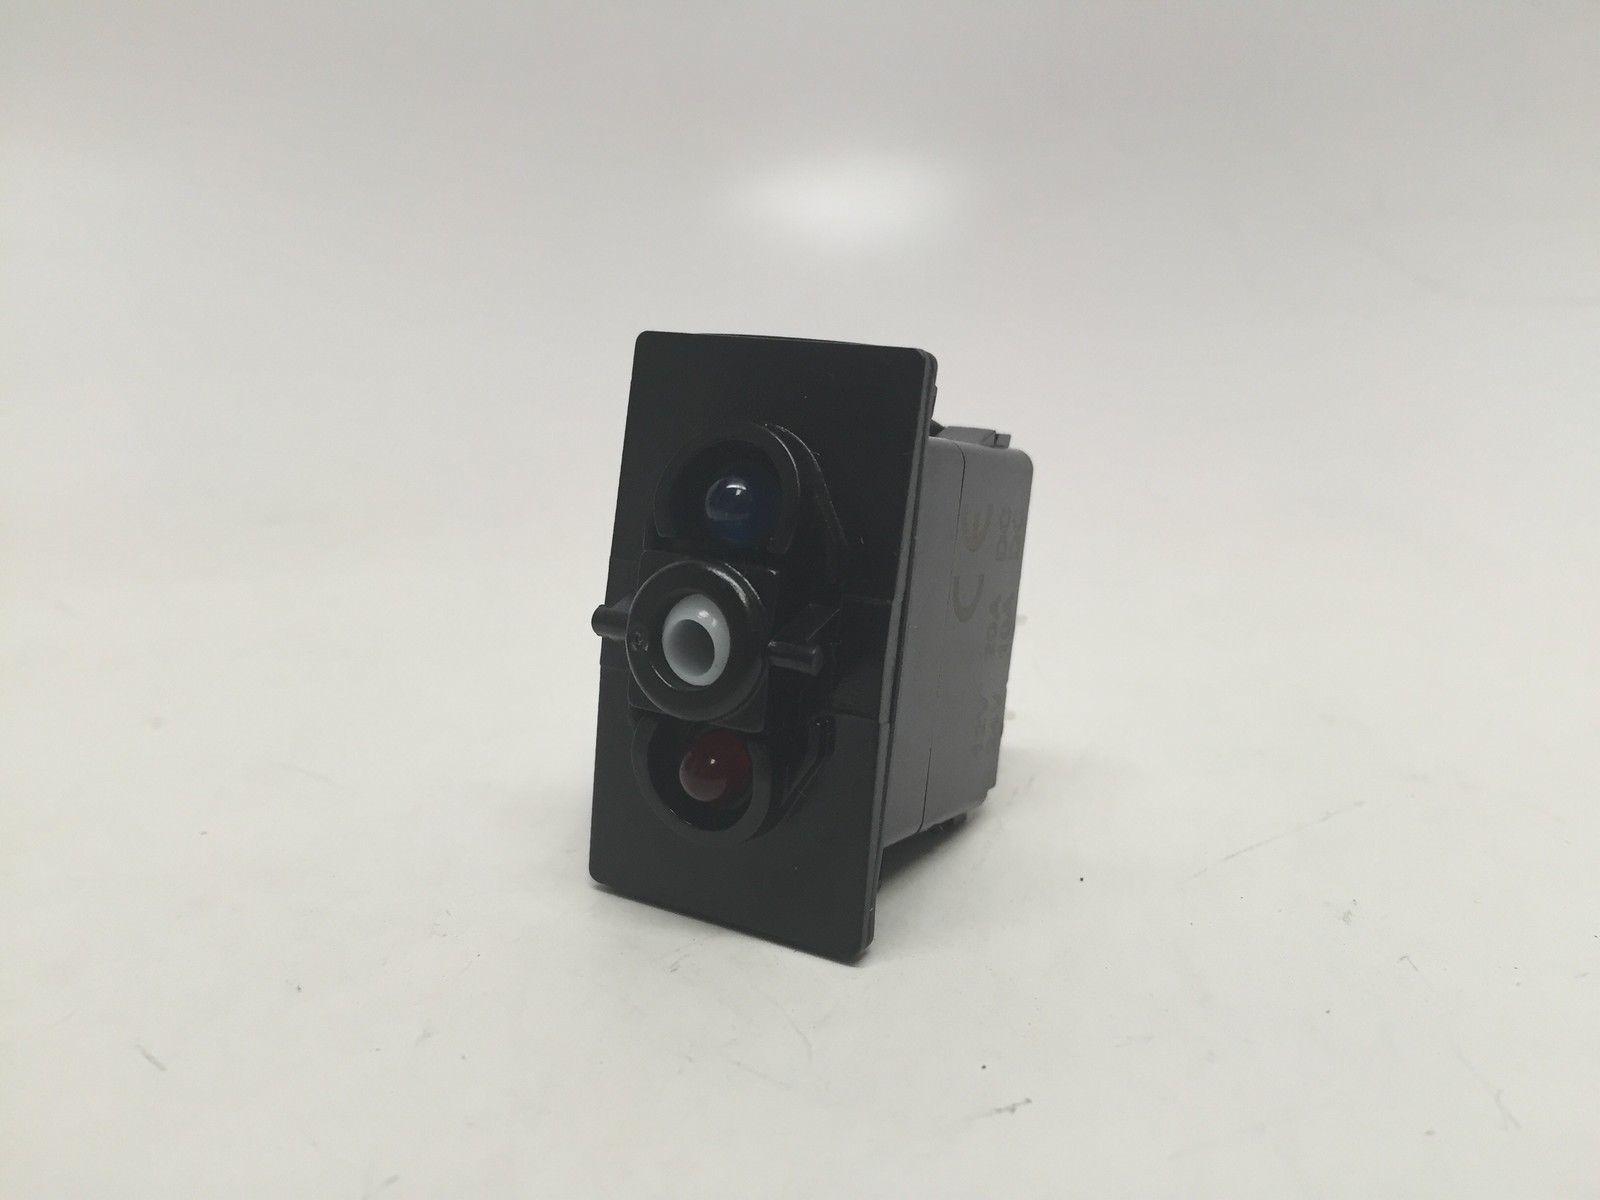 Rv Auto Trailer Power Rocker Switch On Off On Spdt 4 Pin 2